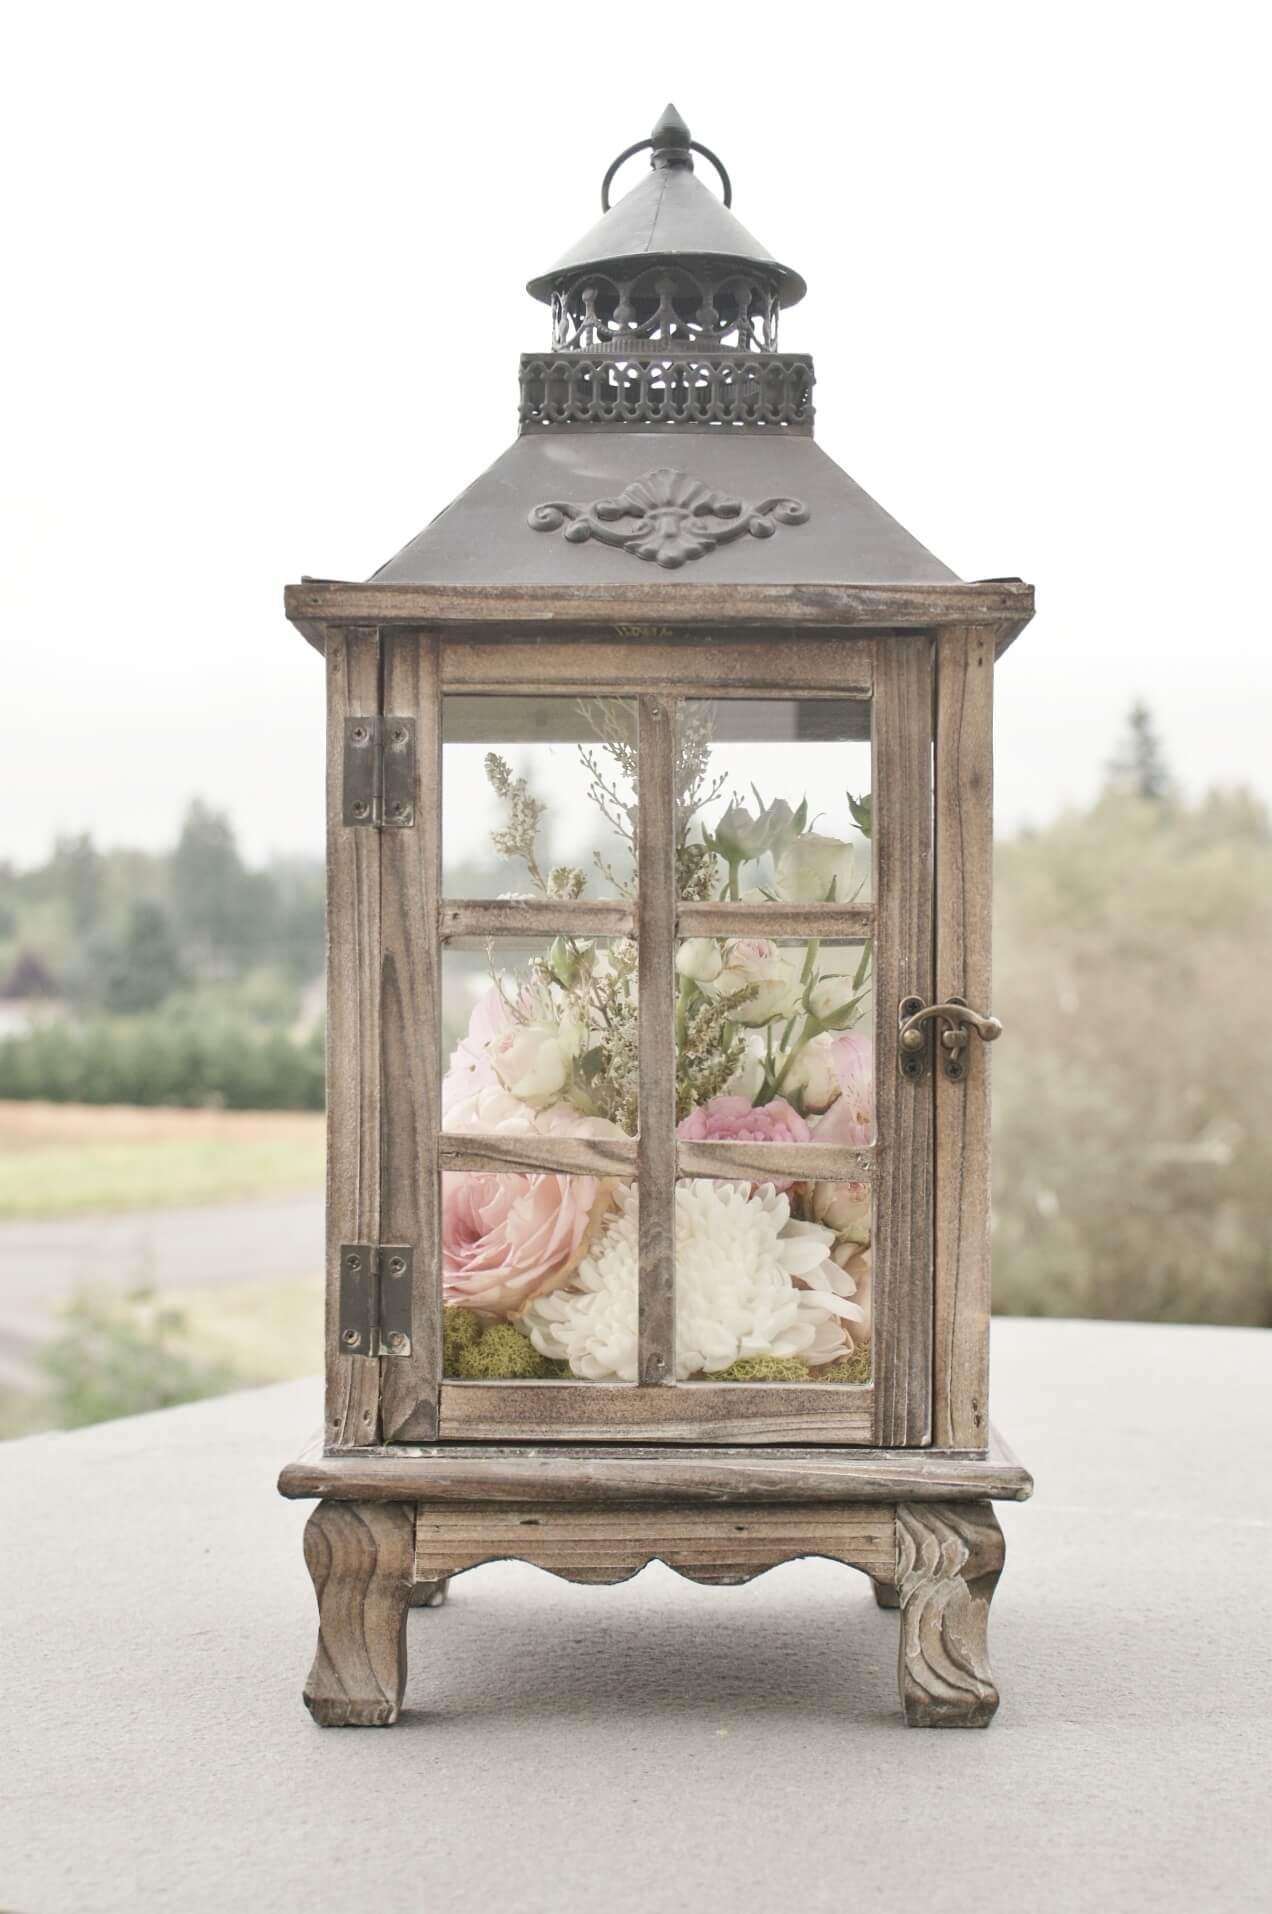 Rustic Lantern with Flower Arrangement